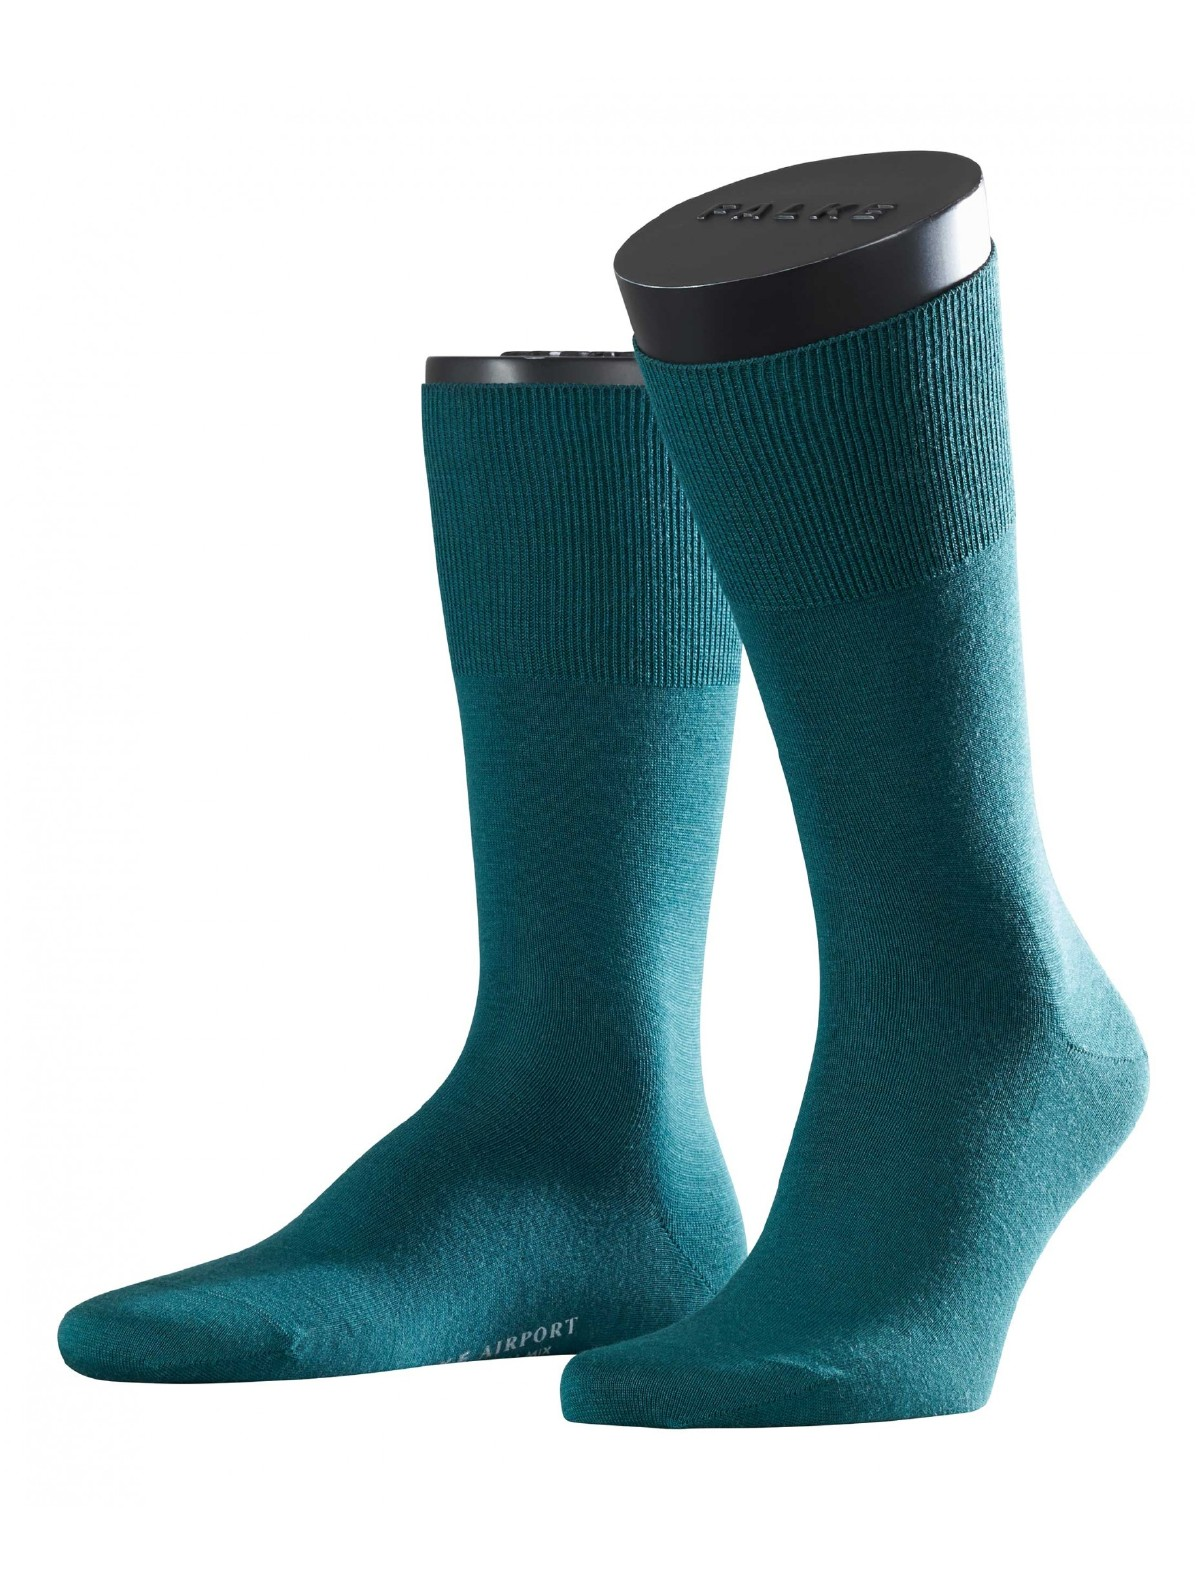 Mens Airport Socks, Opaque Falke